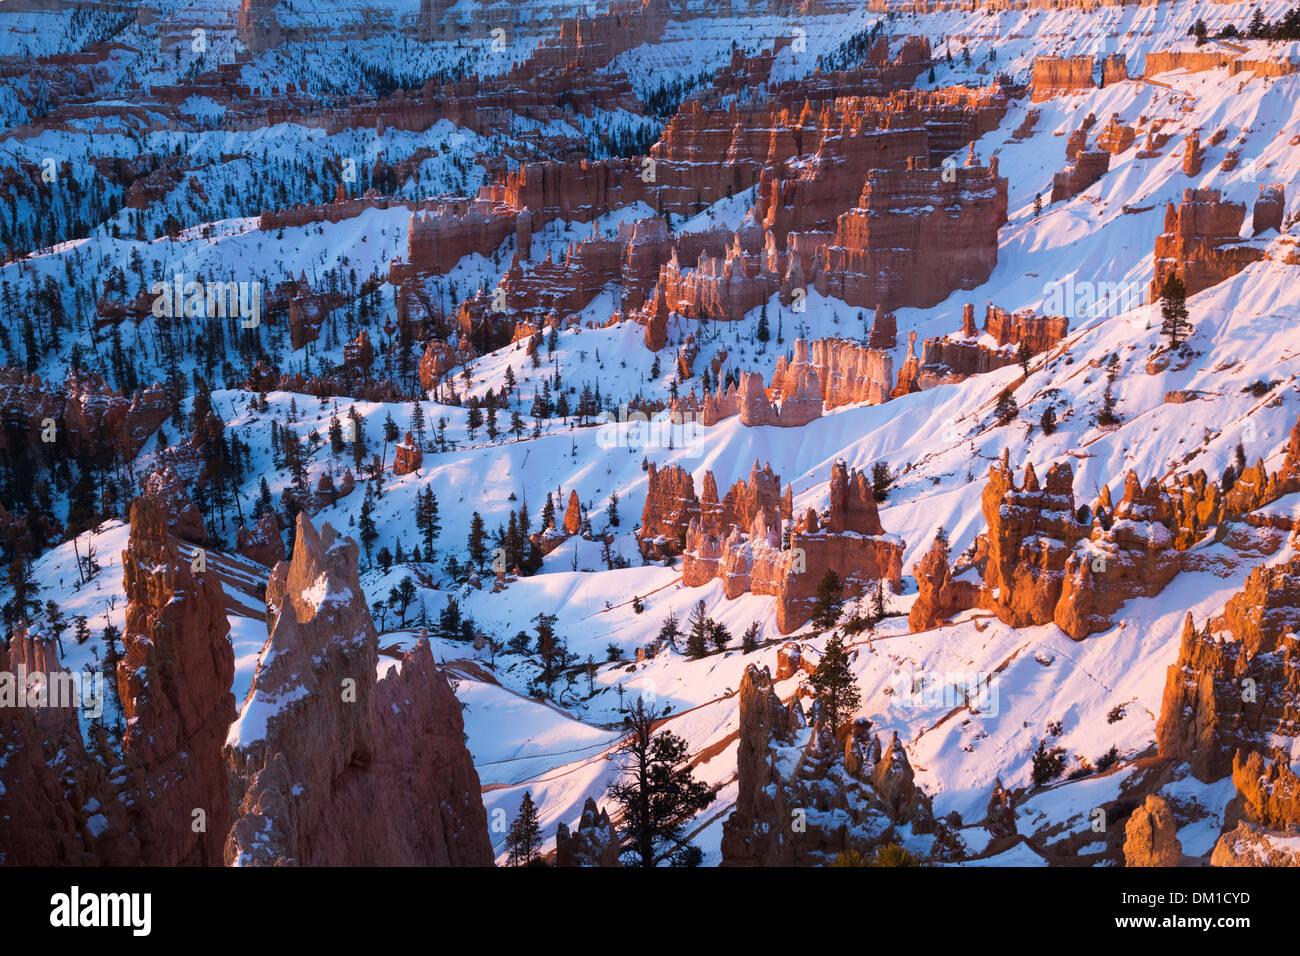 Les cheminées en hiver, Bryce Canyon, Utah, USA Photo Stock